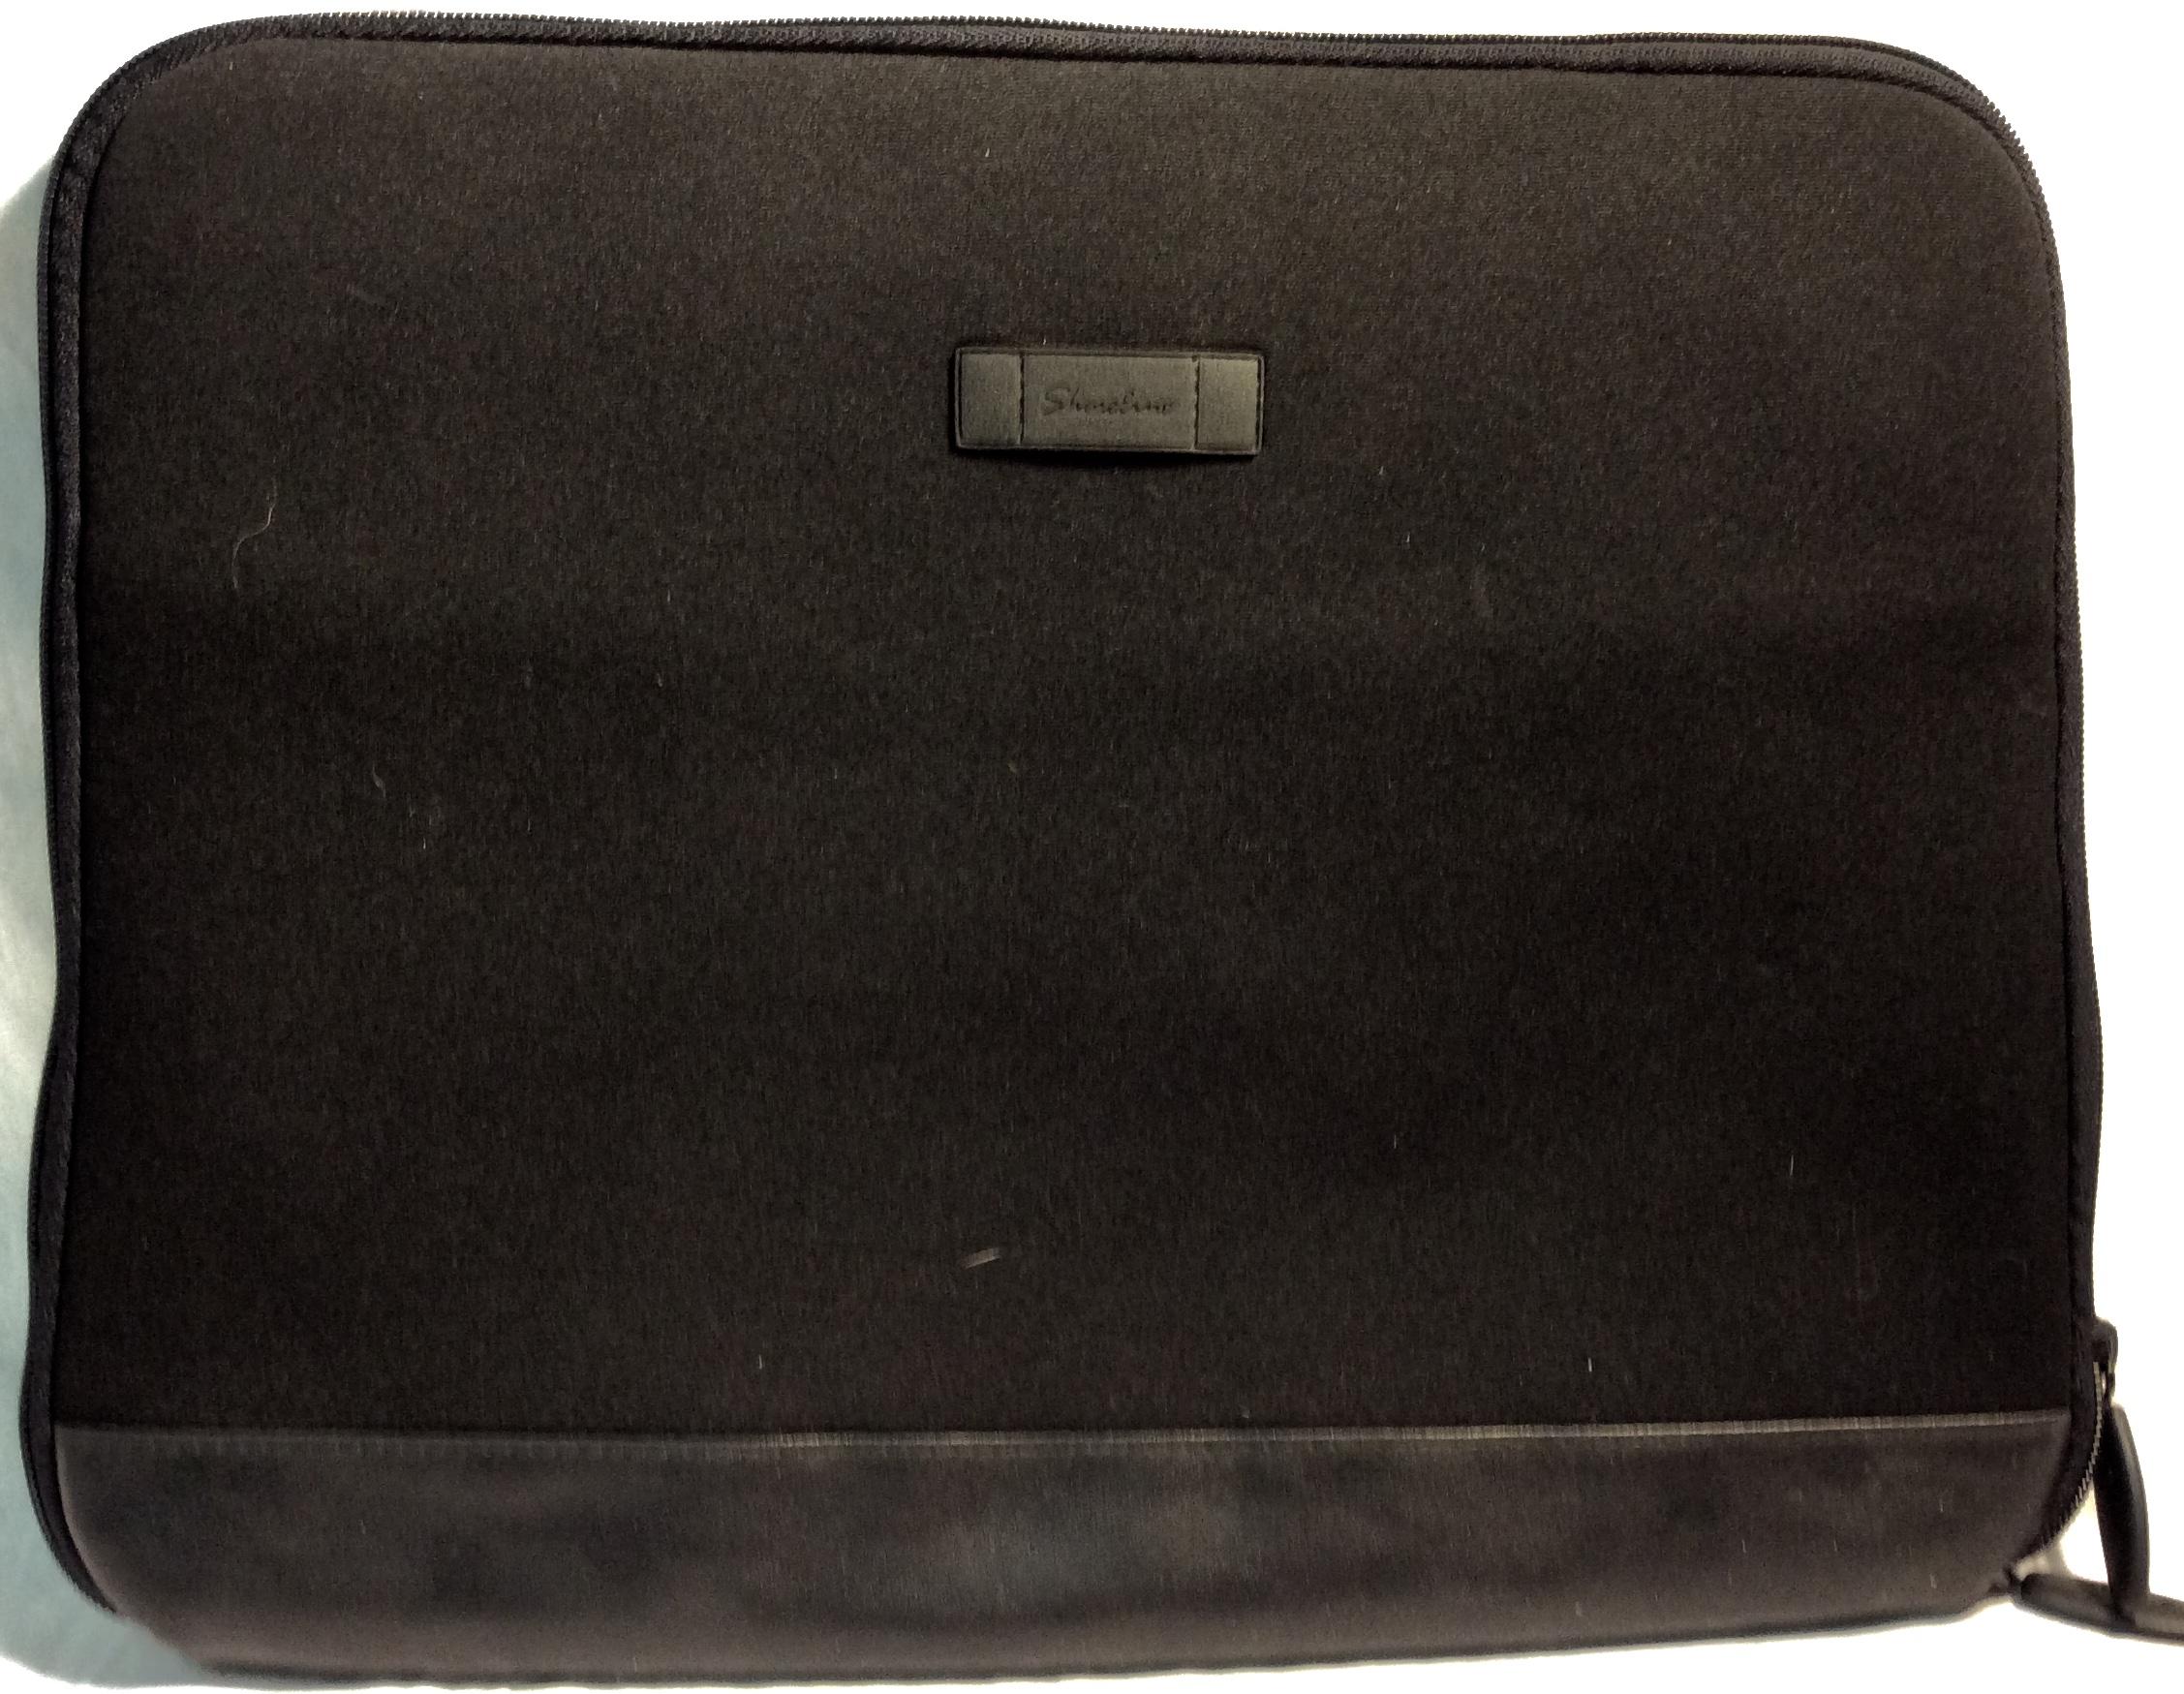 Shoreline Black neoprene laptop case/bag